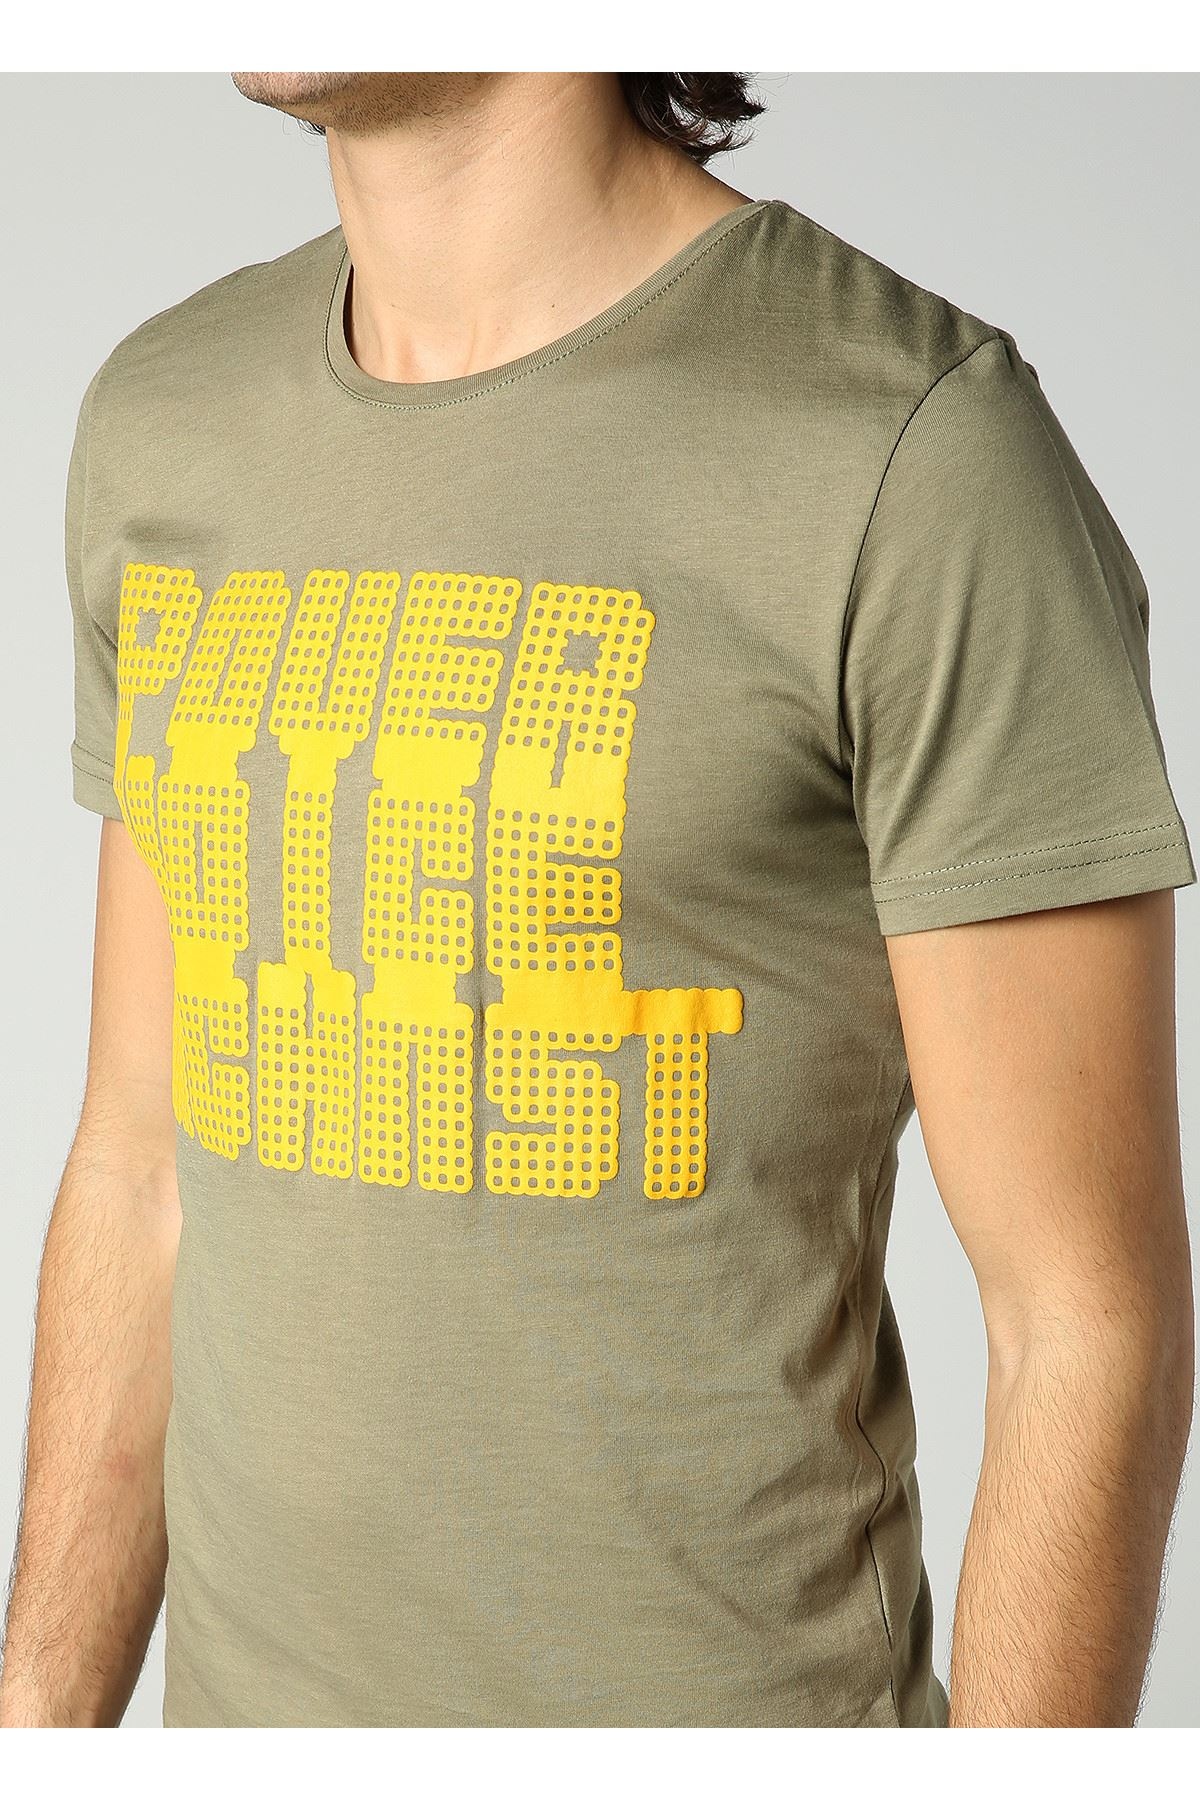 Bisiklet Yaka Power Baskılı Erkek Haki T-Shirt